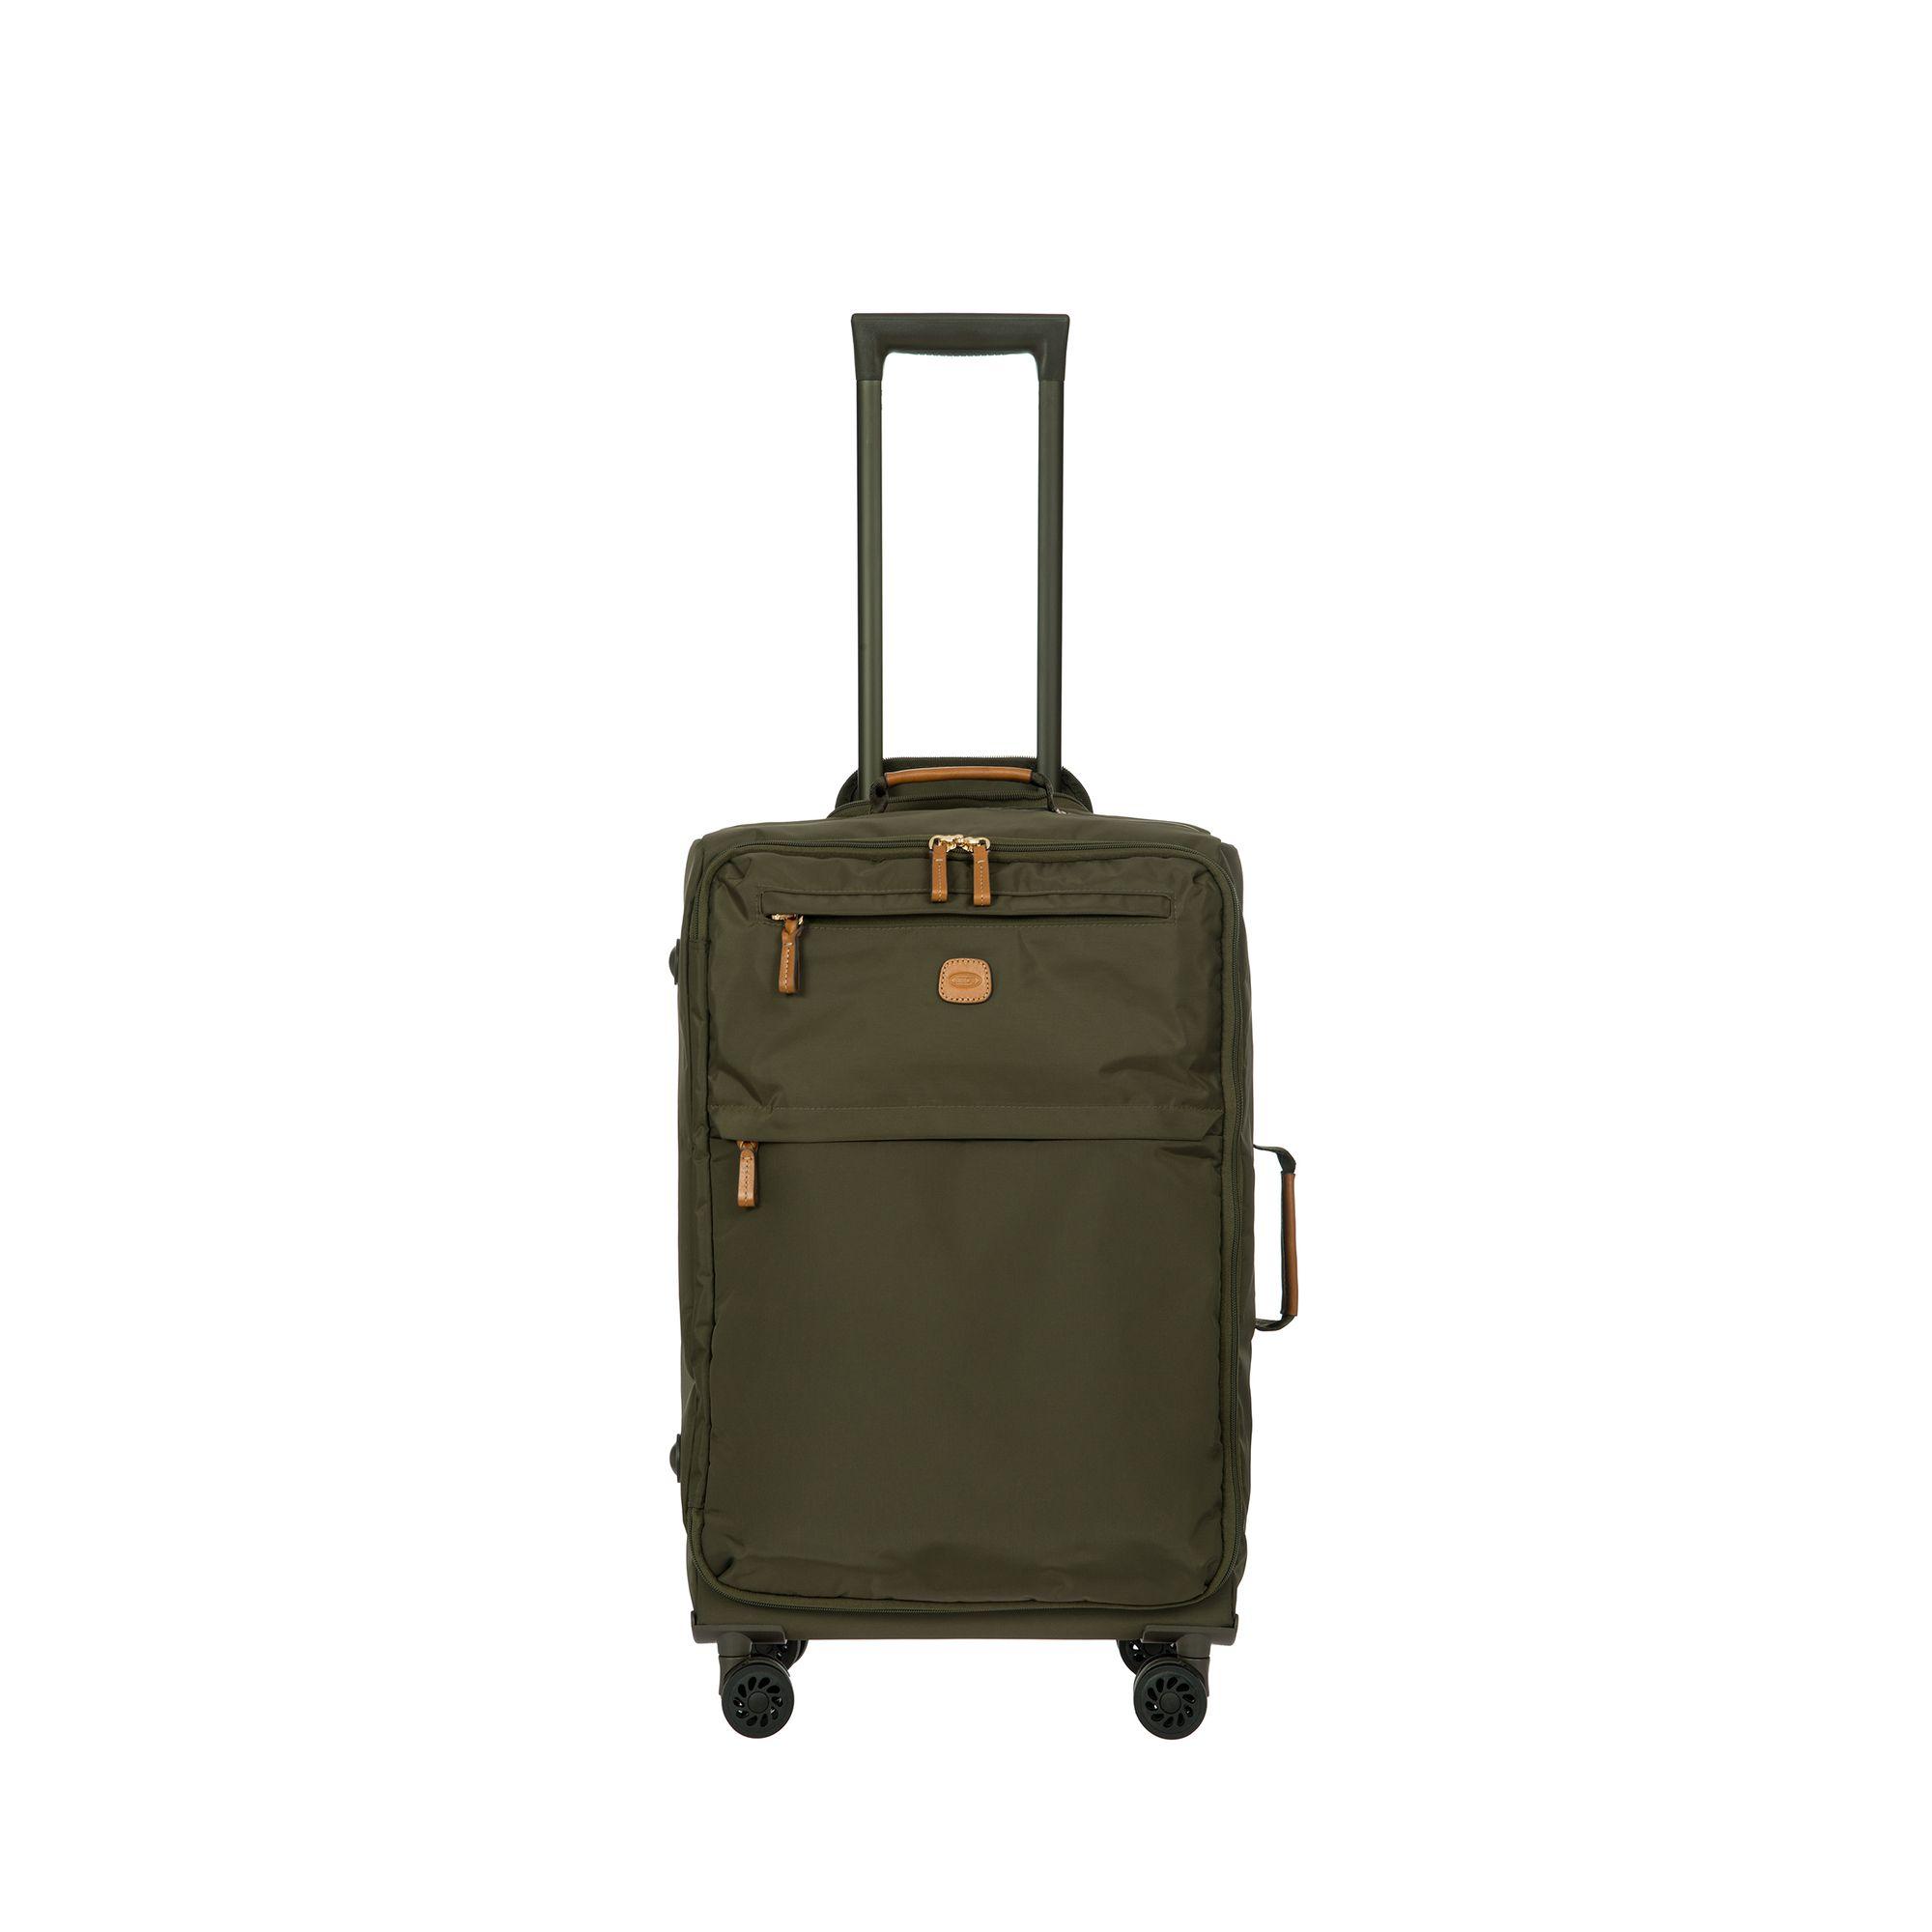 BRIC'S X-Travel mjuk kabinväska i nylon, 4 hjul, 55 cm, Grön